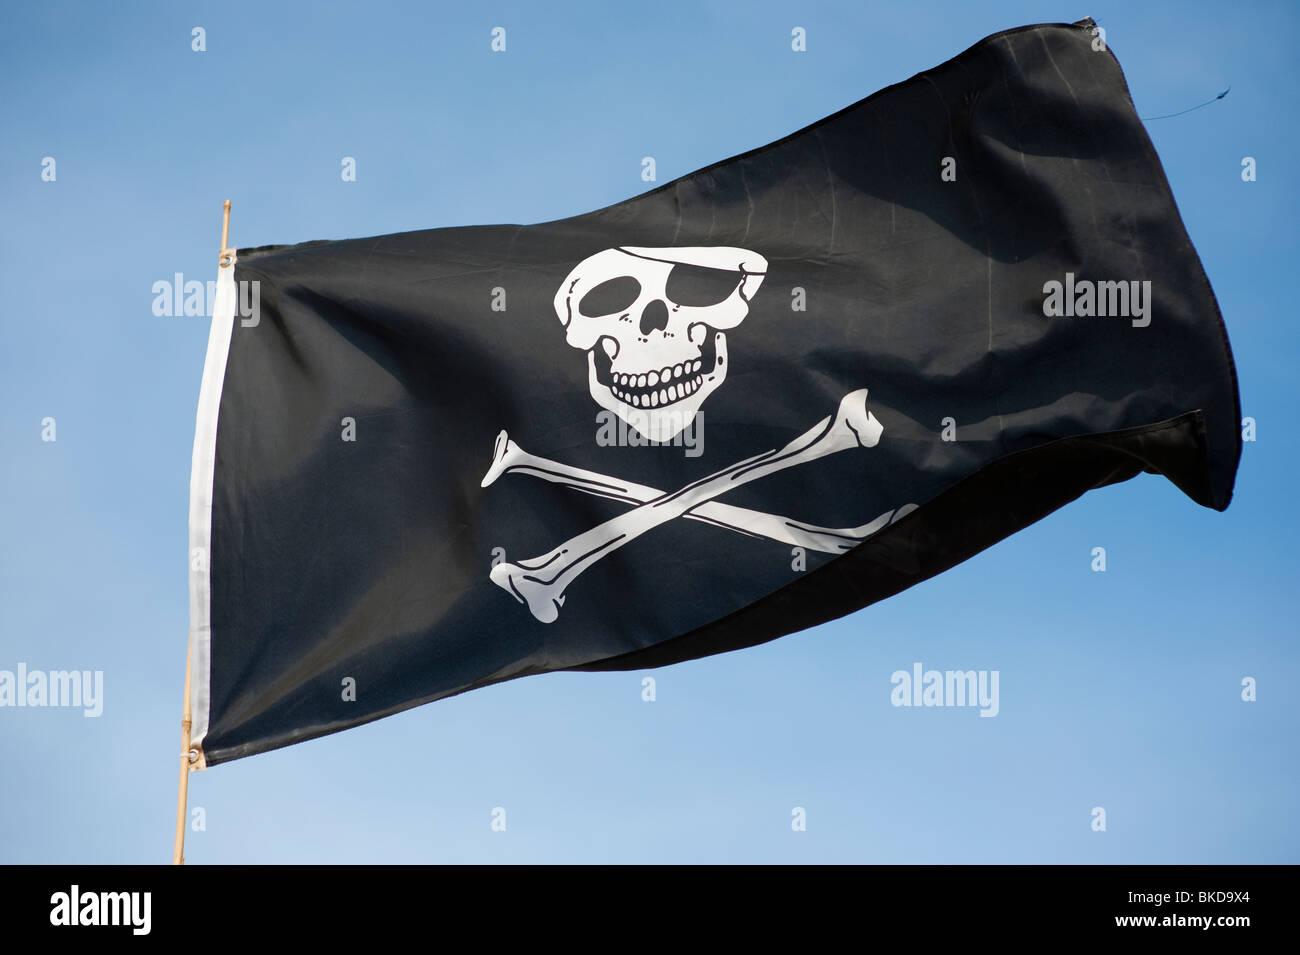 Símbolo de calavera Jolly Roger bandera pirata bandera Imagen De Stock